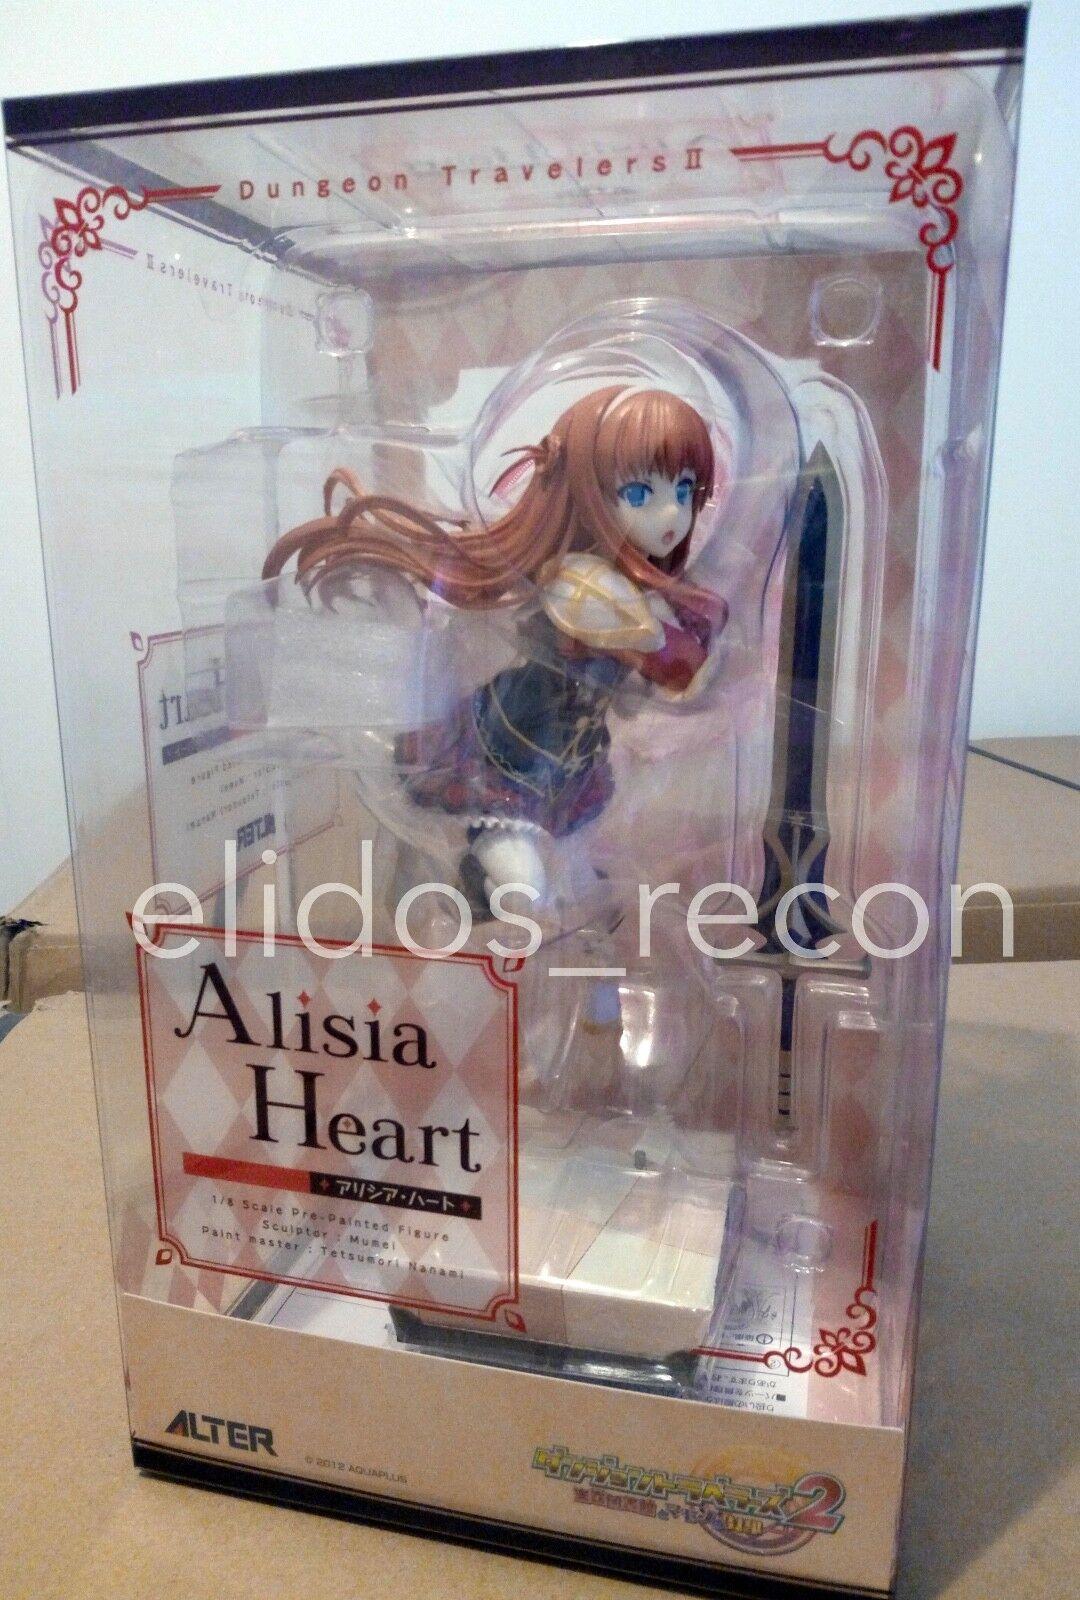 Dungeon Travelers 2 Alisia Heart  1 8 Alter statue PVC